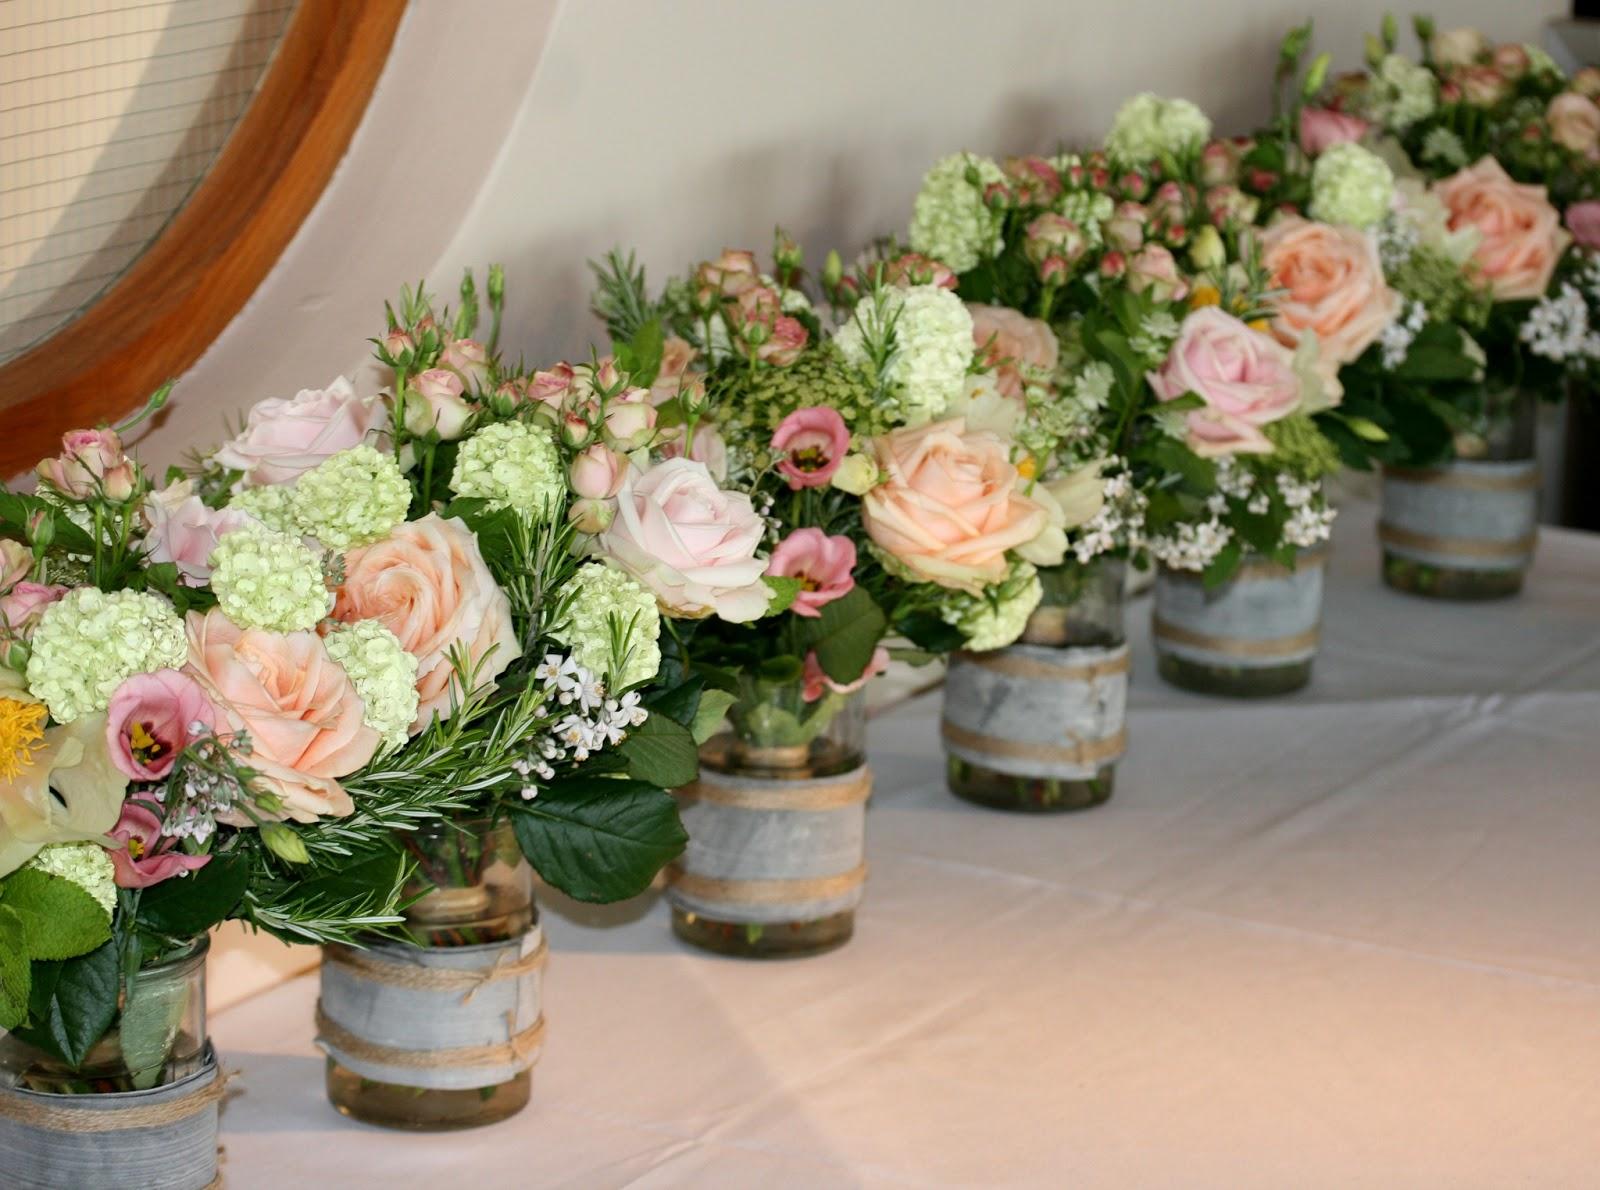 The flower studio portchester annettes vintage lace wedding at annettes vintage lace wedding at the langstone hotel reviewsmspy